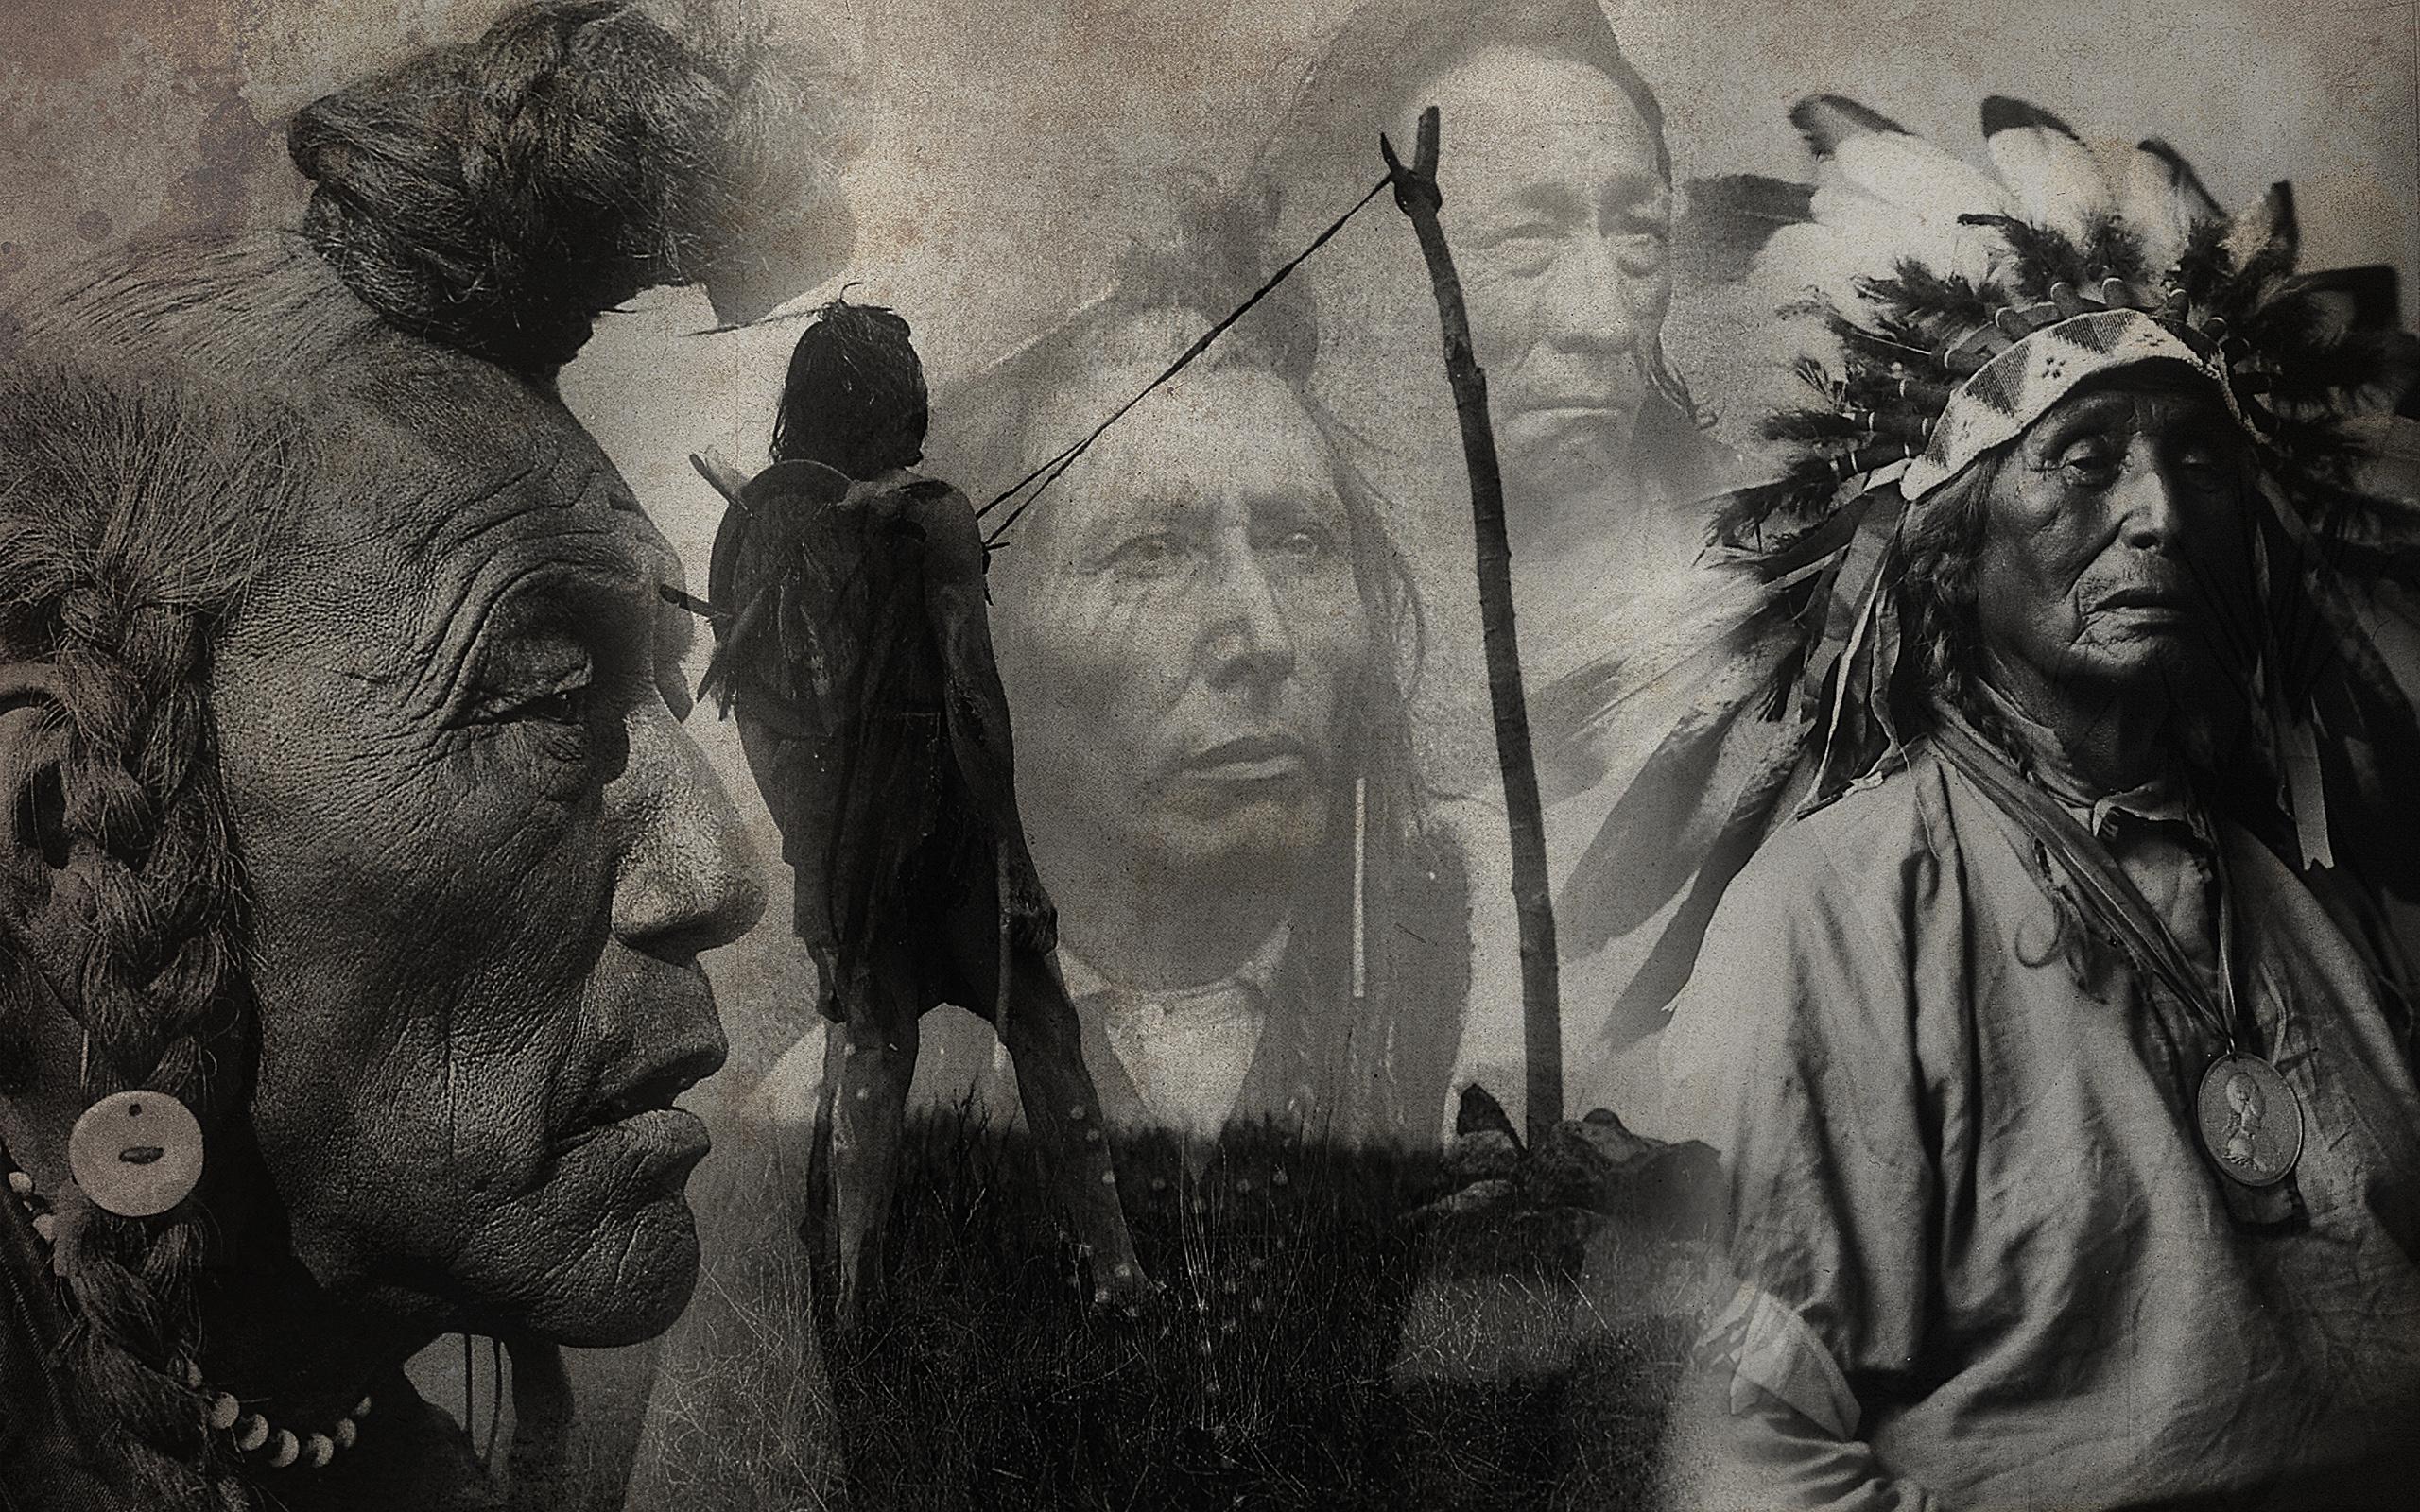 American Indian Desktop Wallpaper 2560x1600